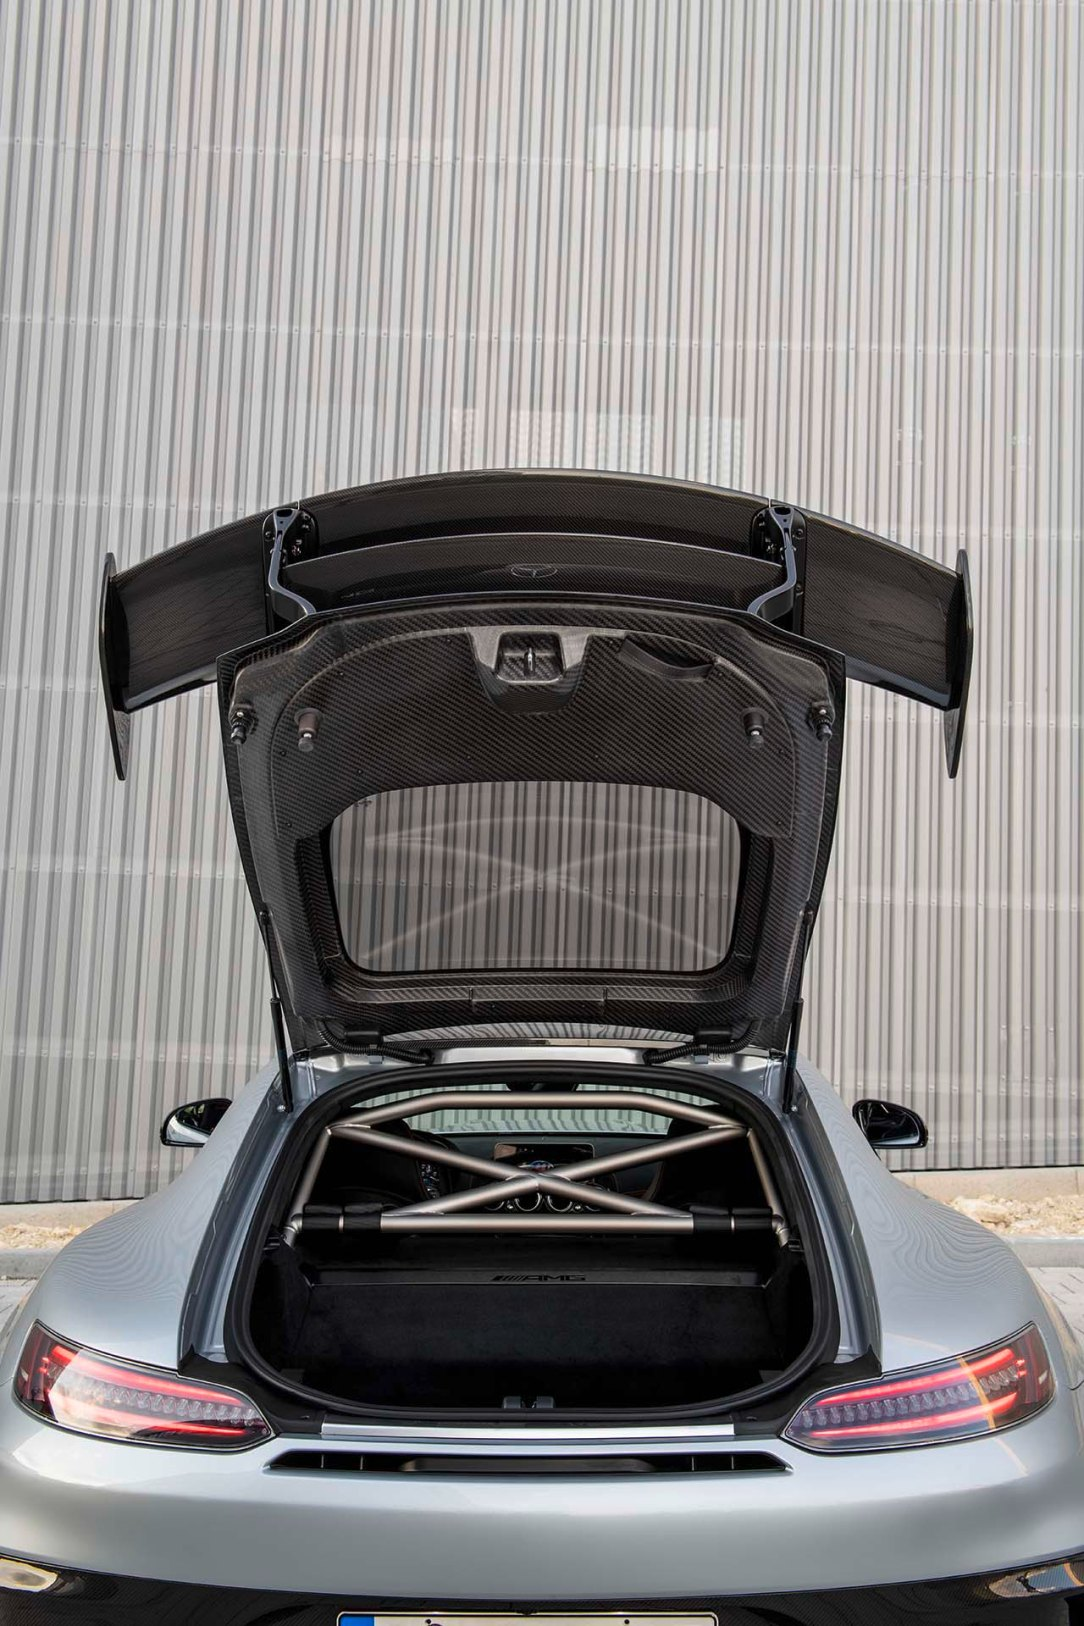 Die absolute Spitze der GT-Familie: Der neue Mercedes-AMG GT Black Series The absolute pinnacle of the AMG GT family: The new Mercedes-AMG GT Black Series